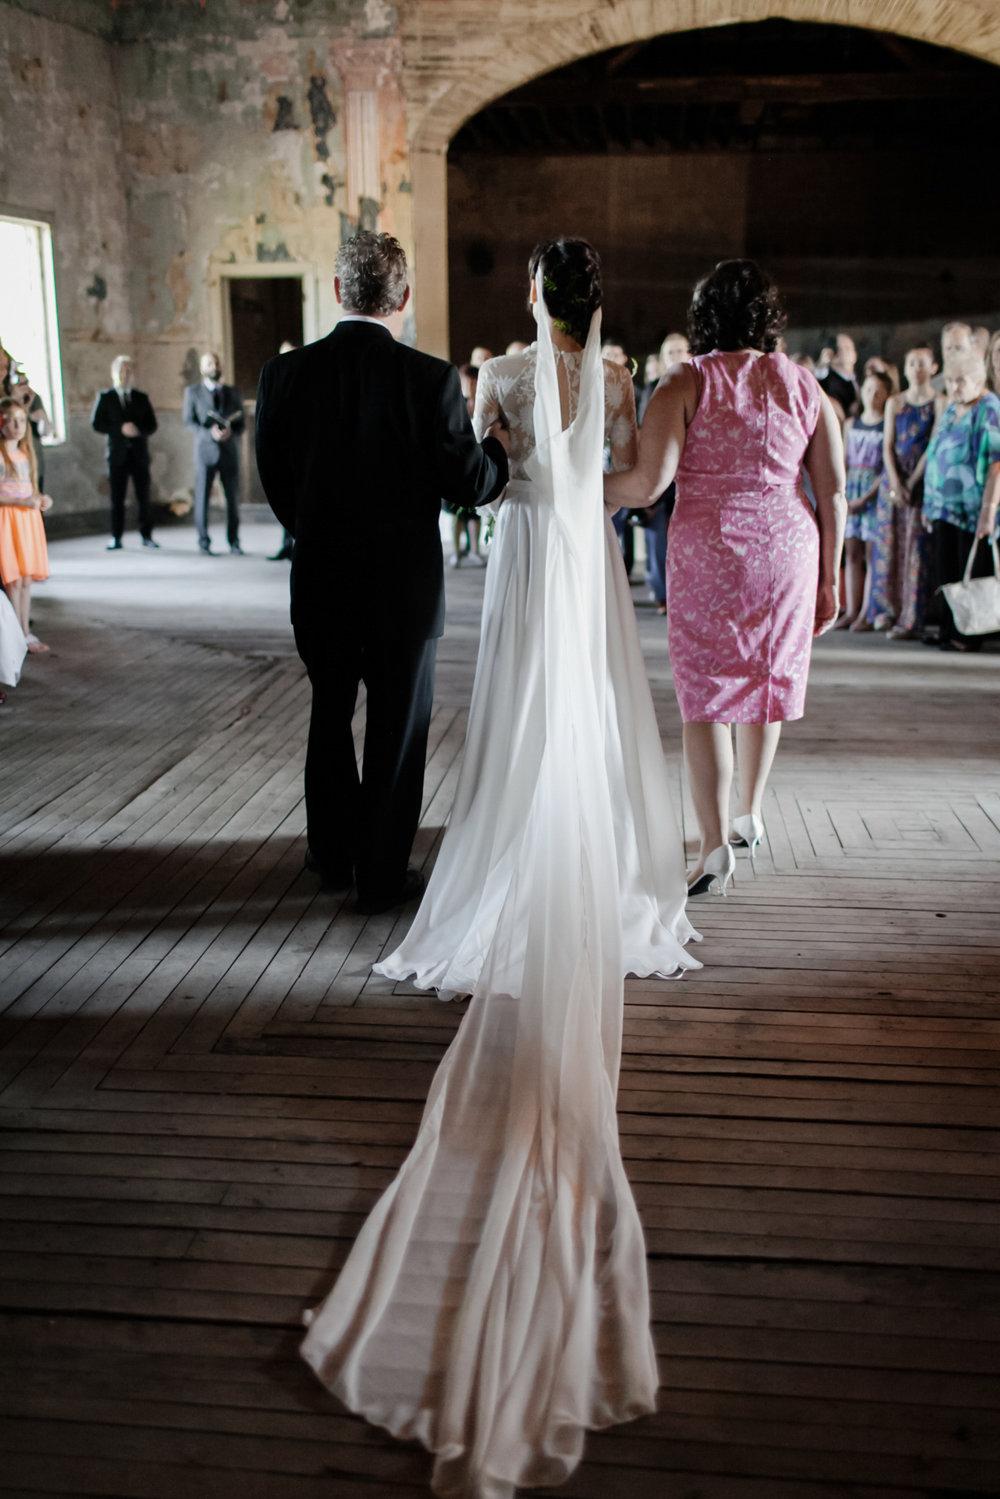 Kimberly-Coccagnia-Wedding-Photographer-74.JPG